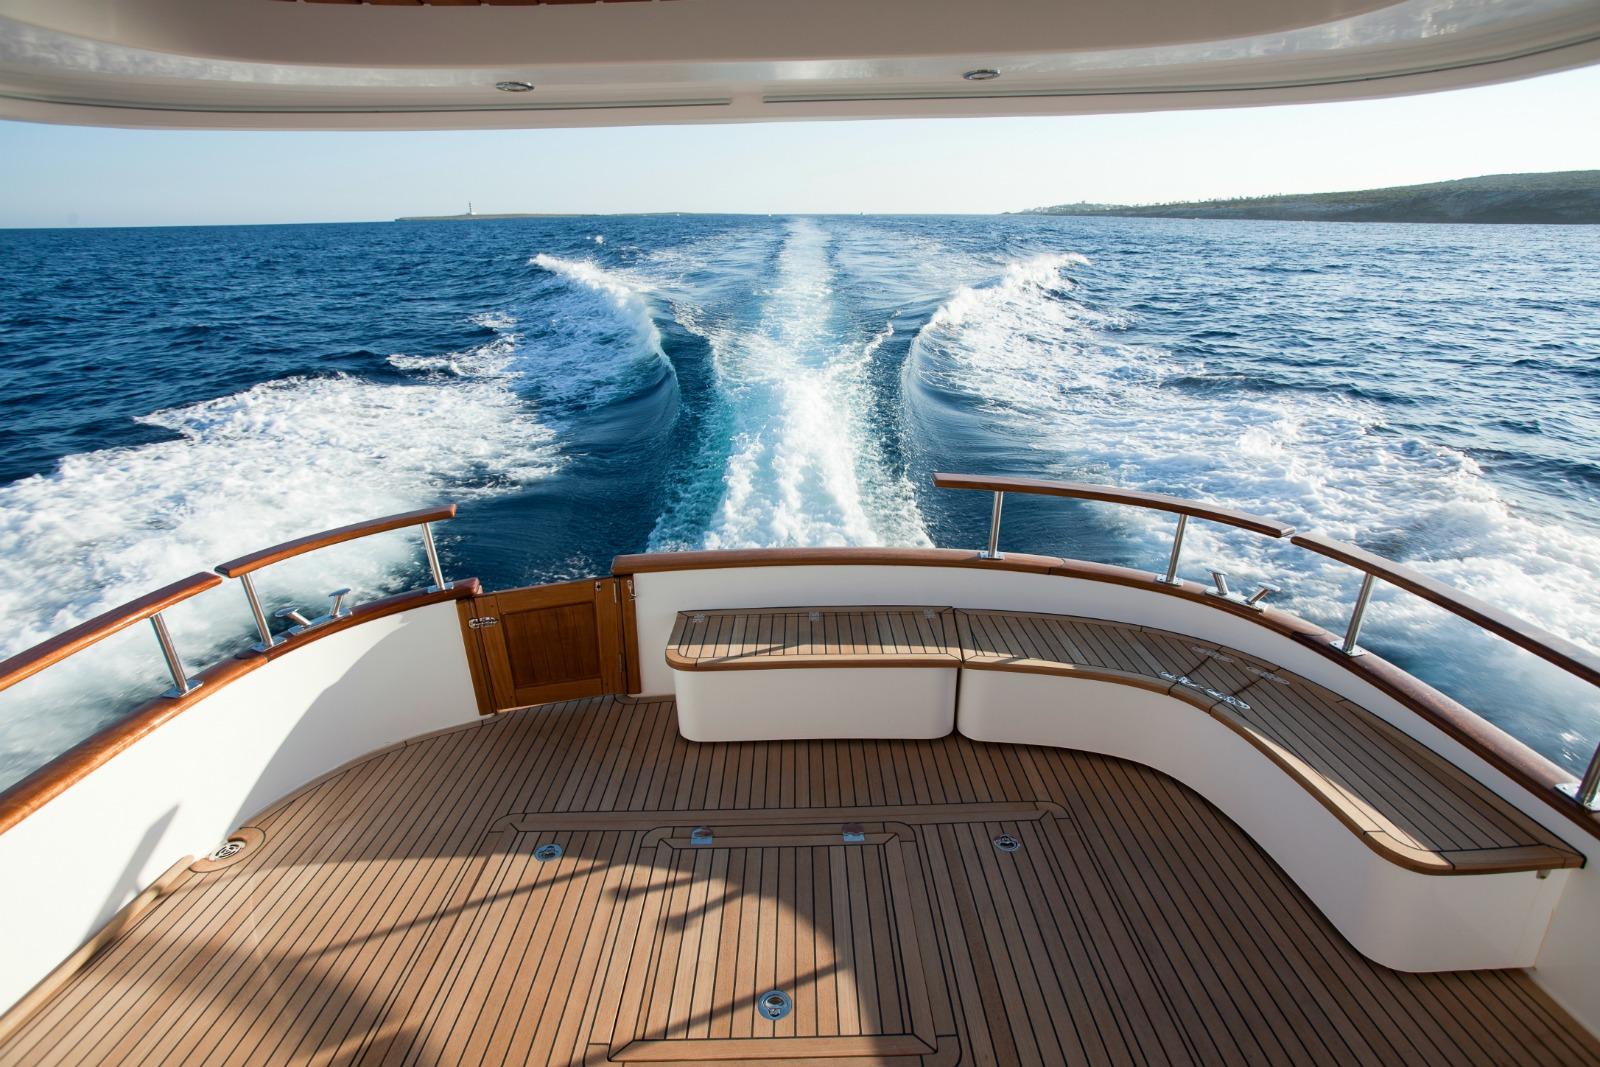 Minorca Islander 42 yacht for sale - Aft Deck